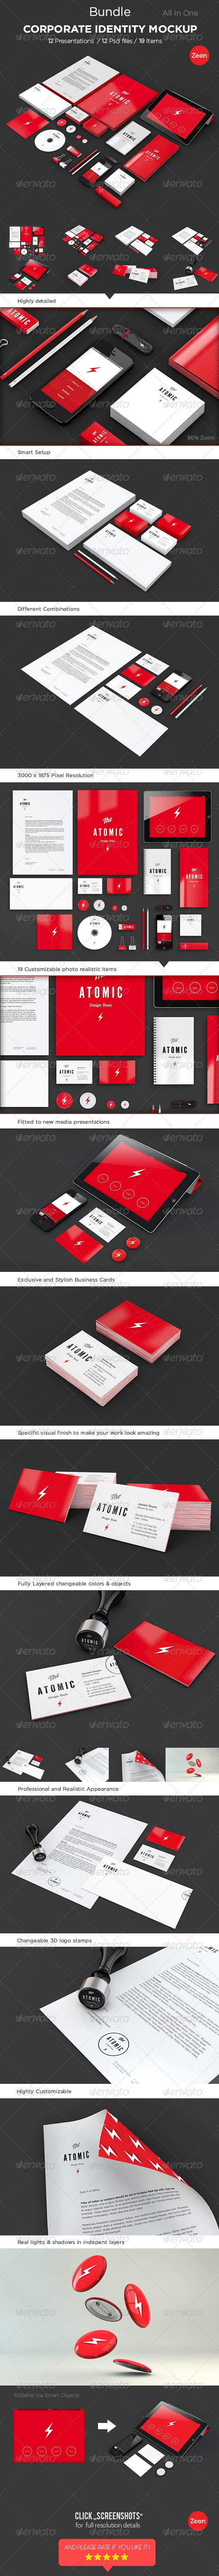 GraphicRiver Corporate Identity Mockup Bundle 4340081